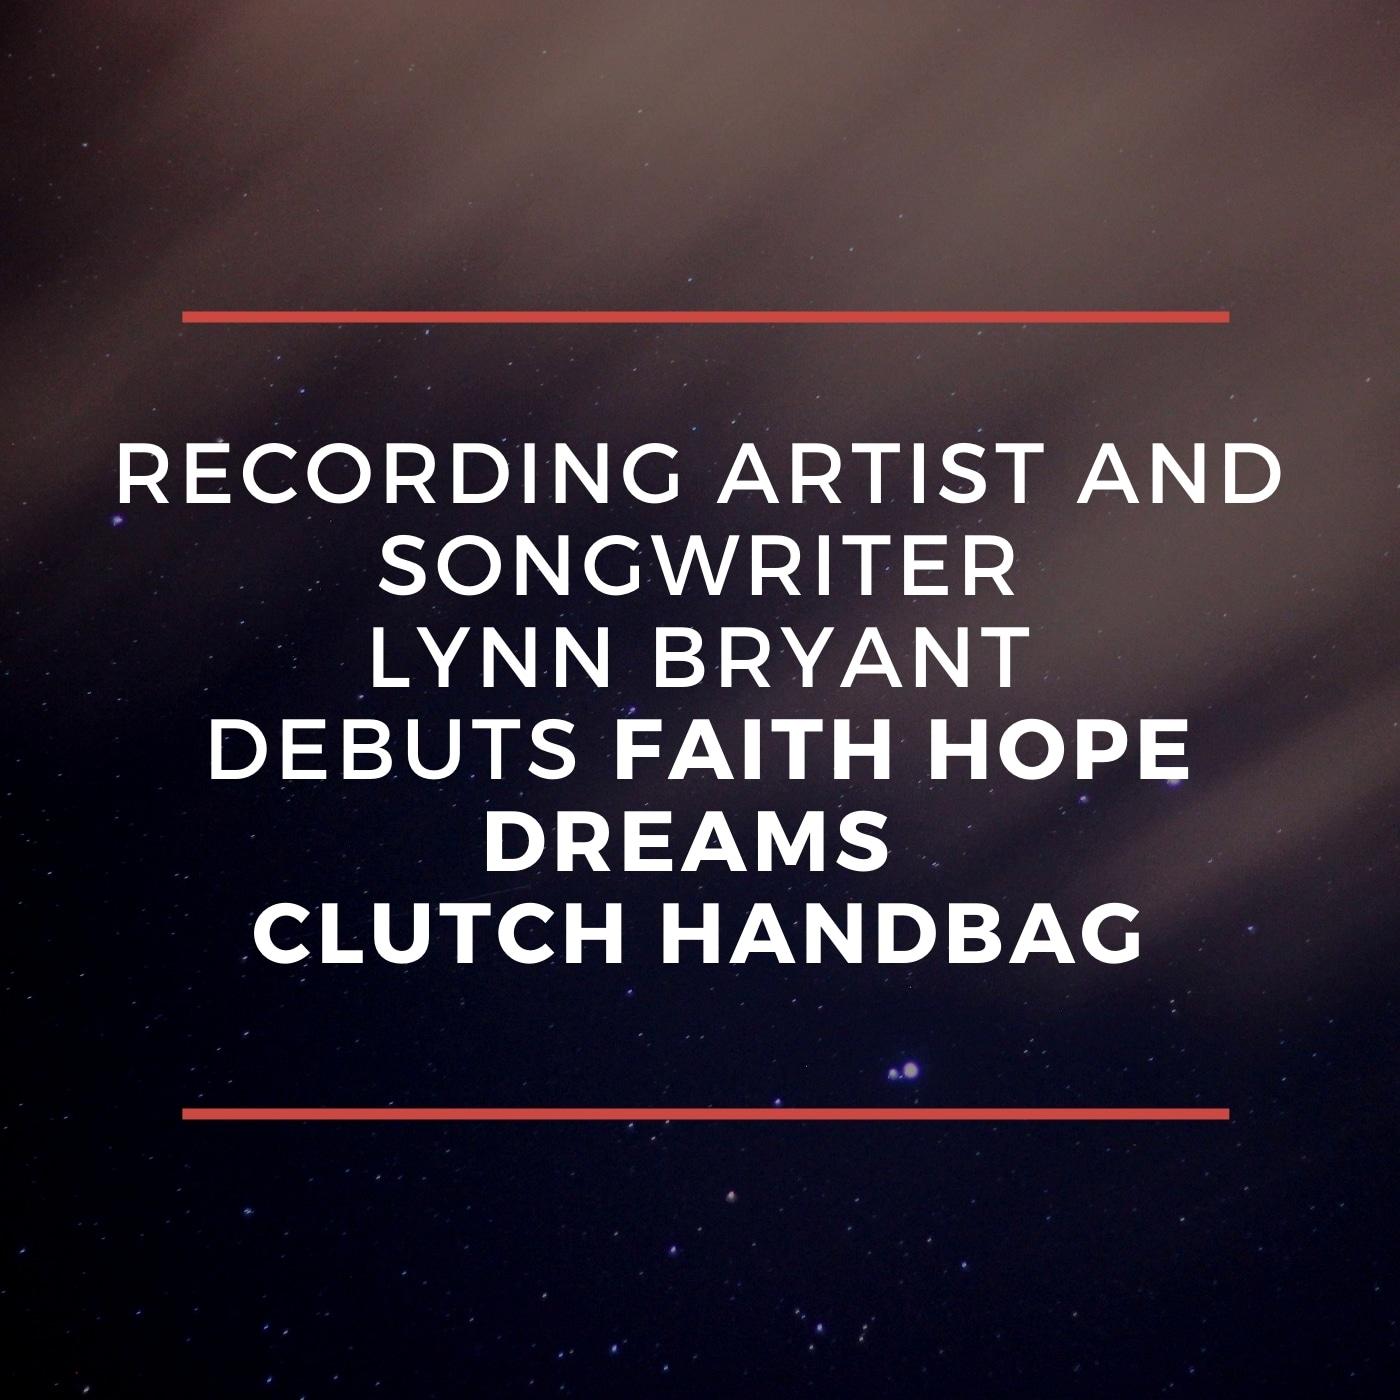 Recording Artist and Songwriter Lynn Bryant Debuts Faith Hope Dreams™ Clutch Handbag